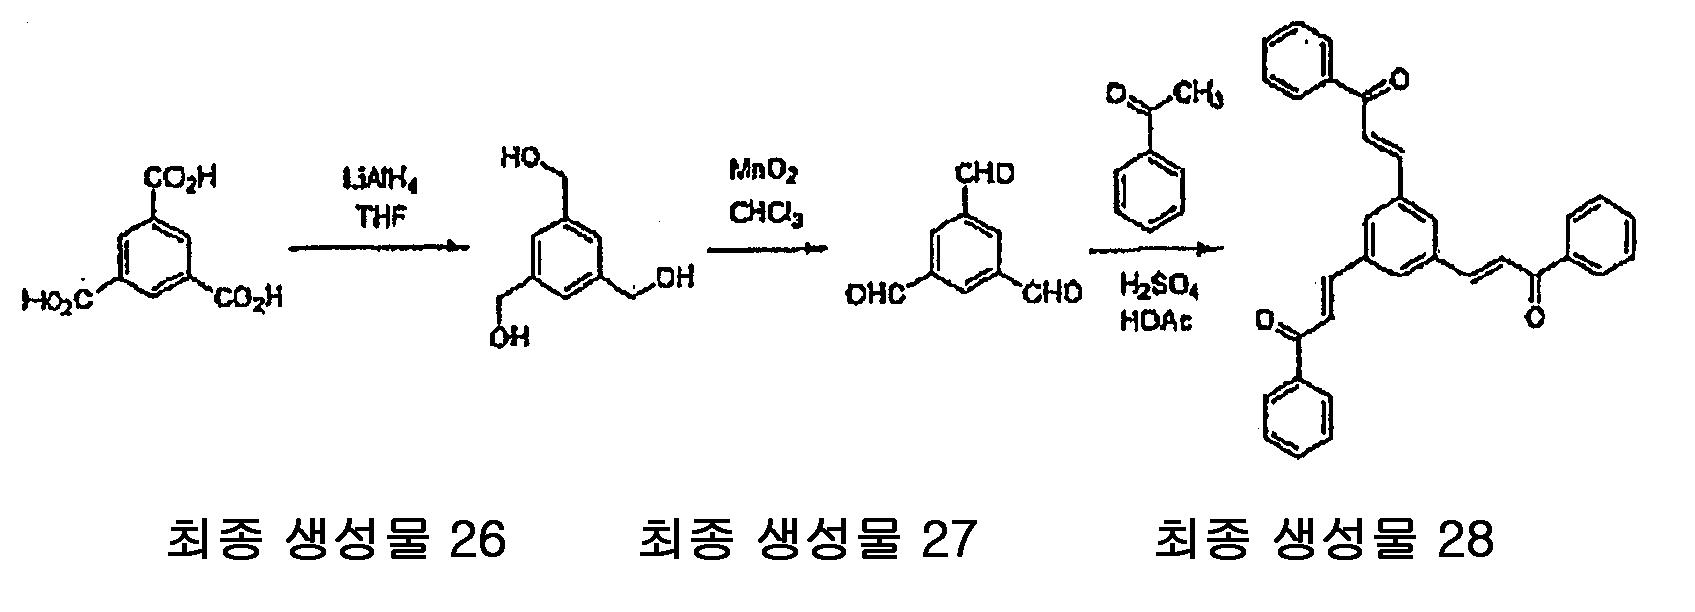 Figure 112010002231902-pat00121